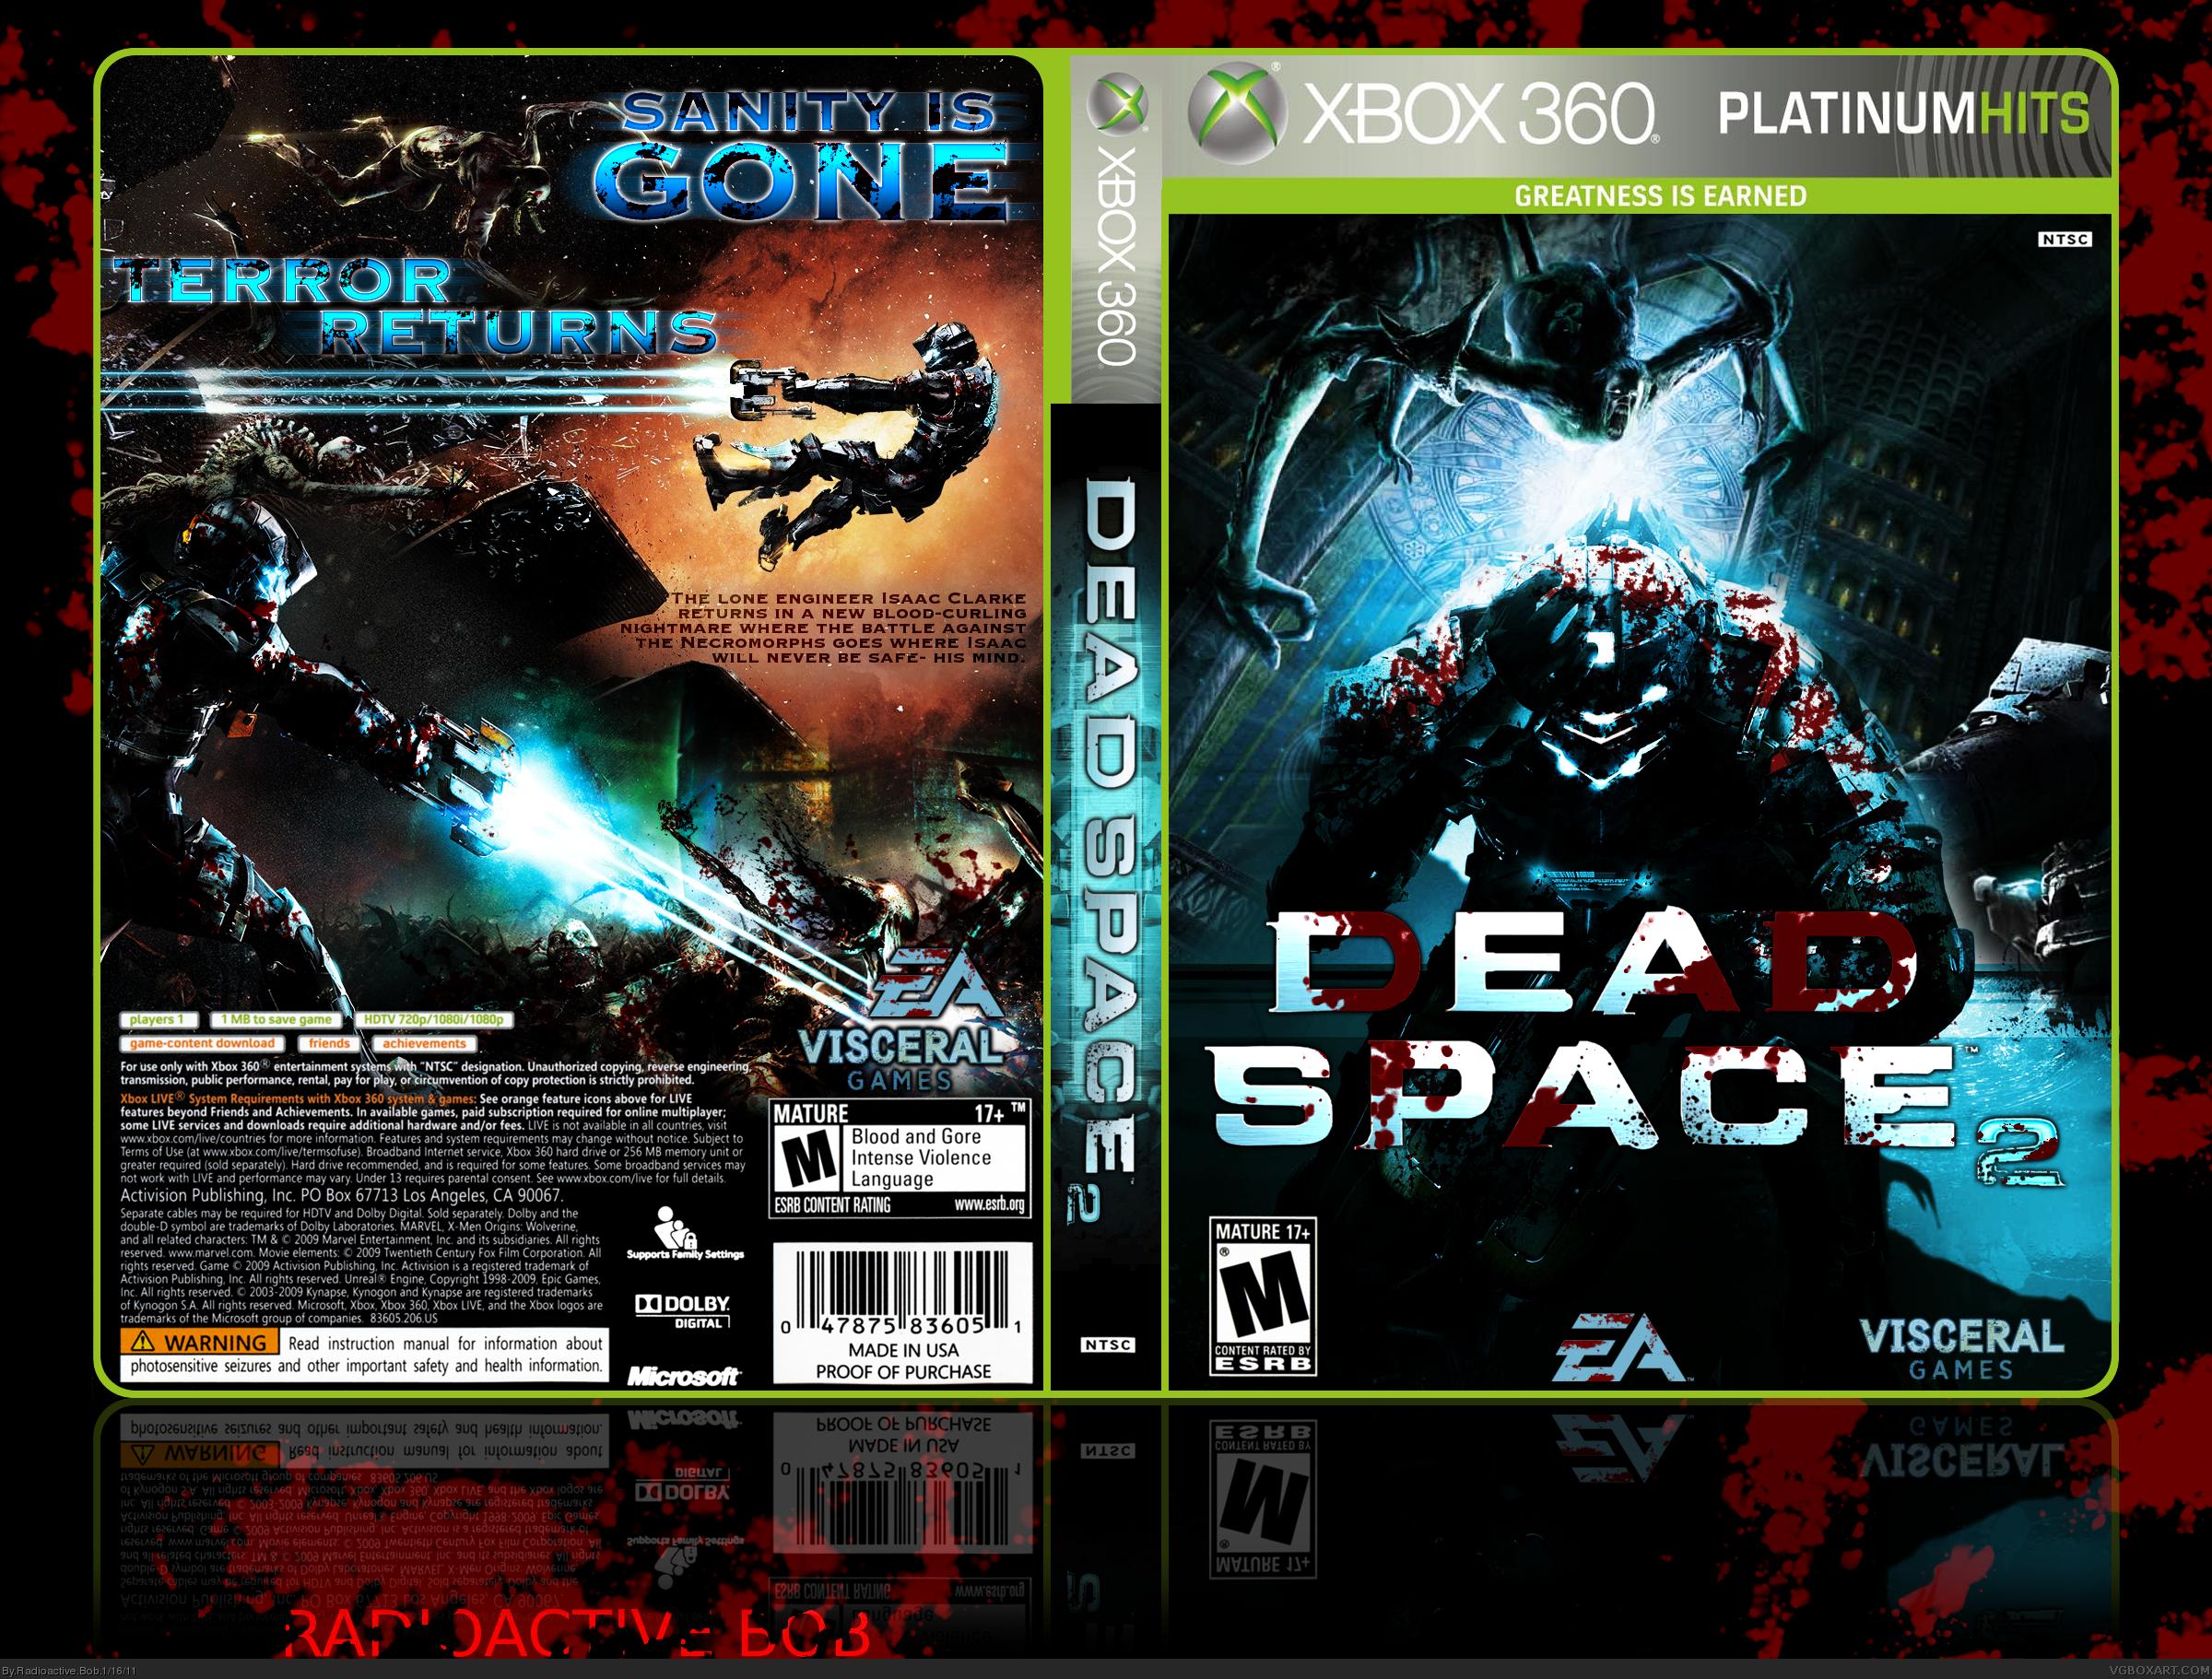 dead space 2 xbox 360 box art cover by radioactive bob rh vgboxart com Dead Space Cheats-PC Dead Space PC Controls